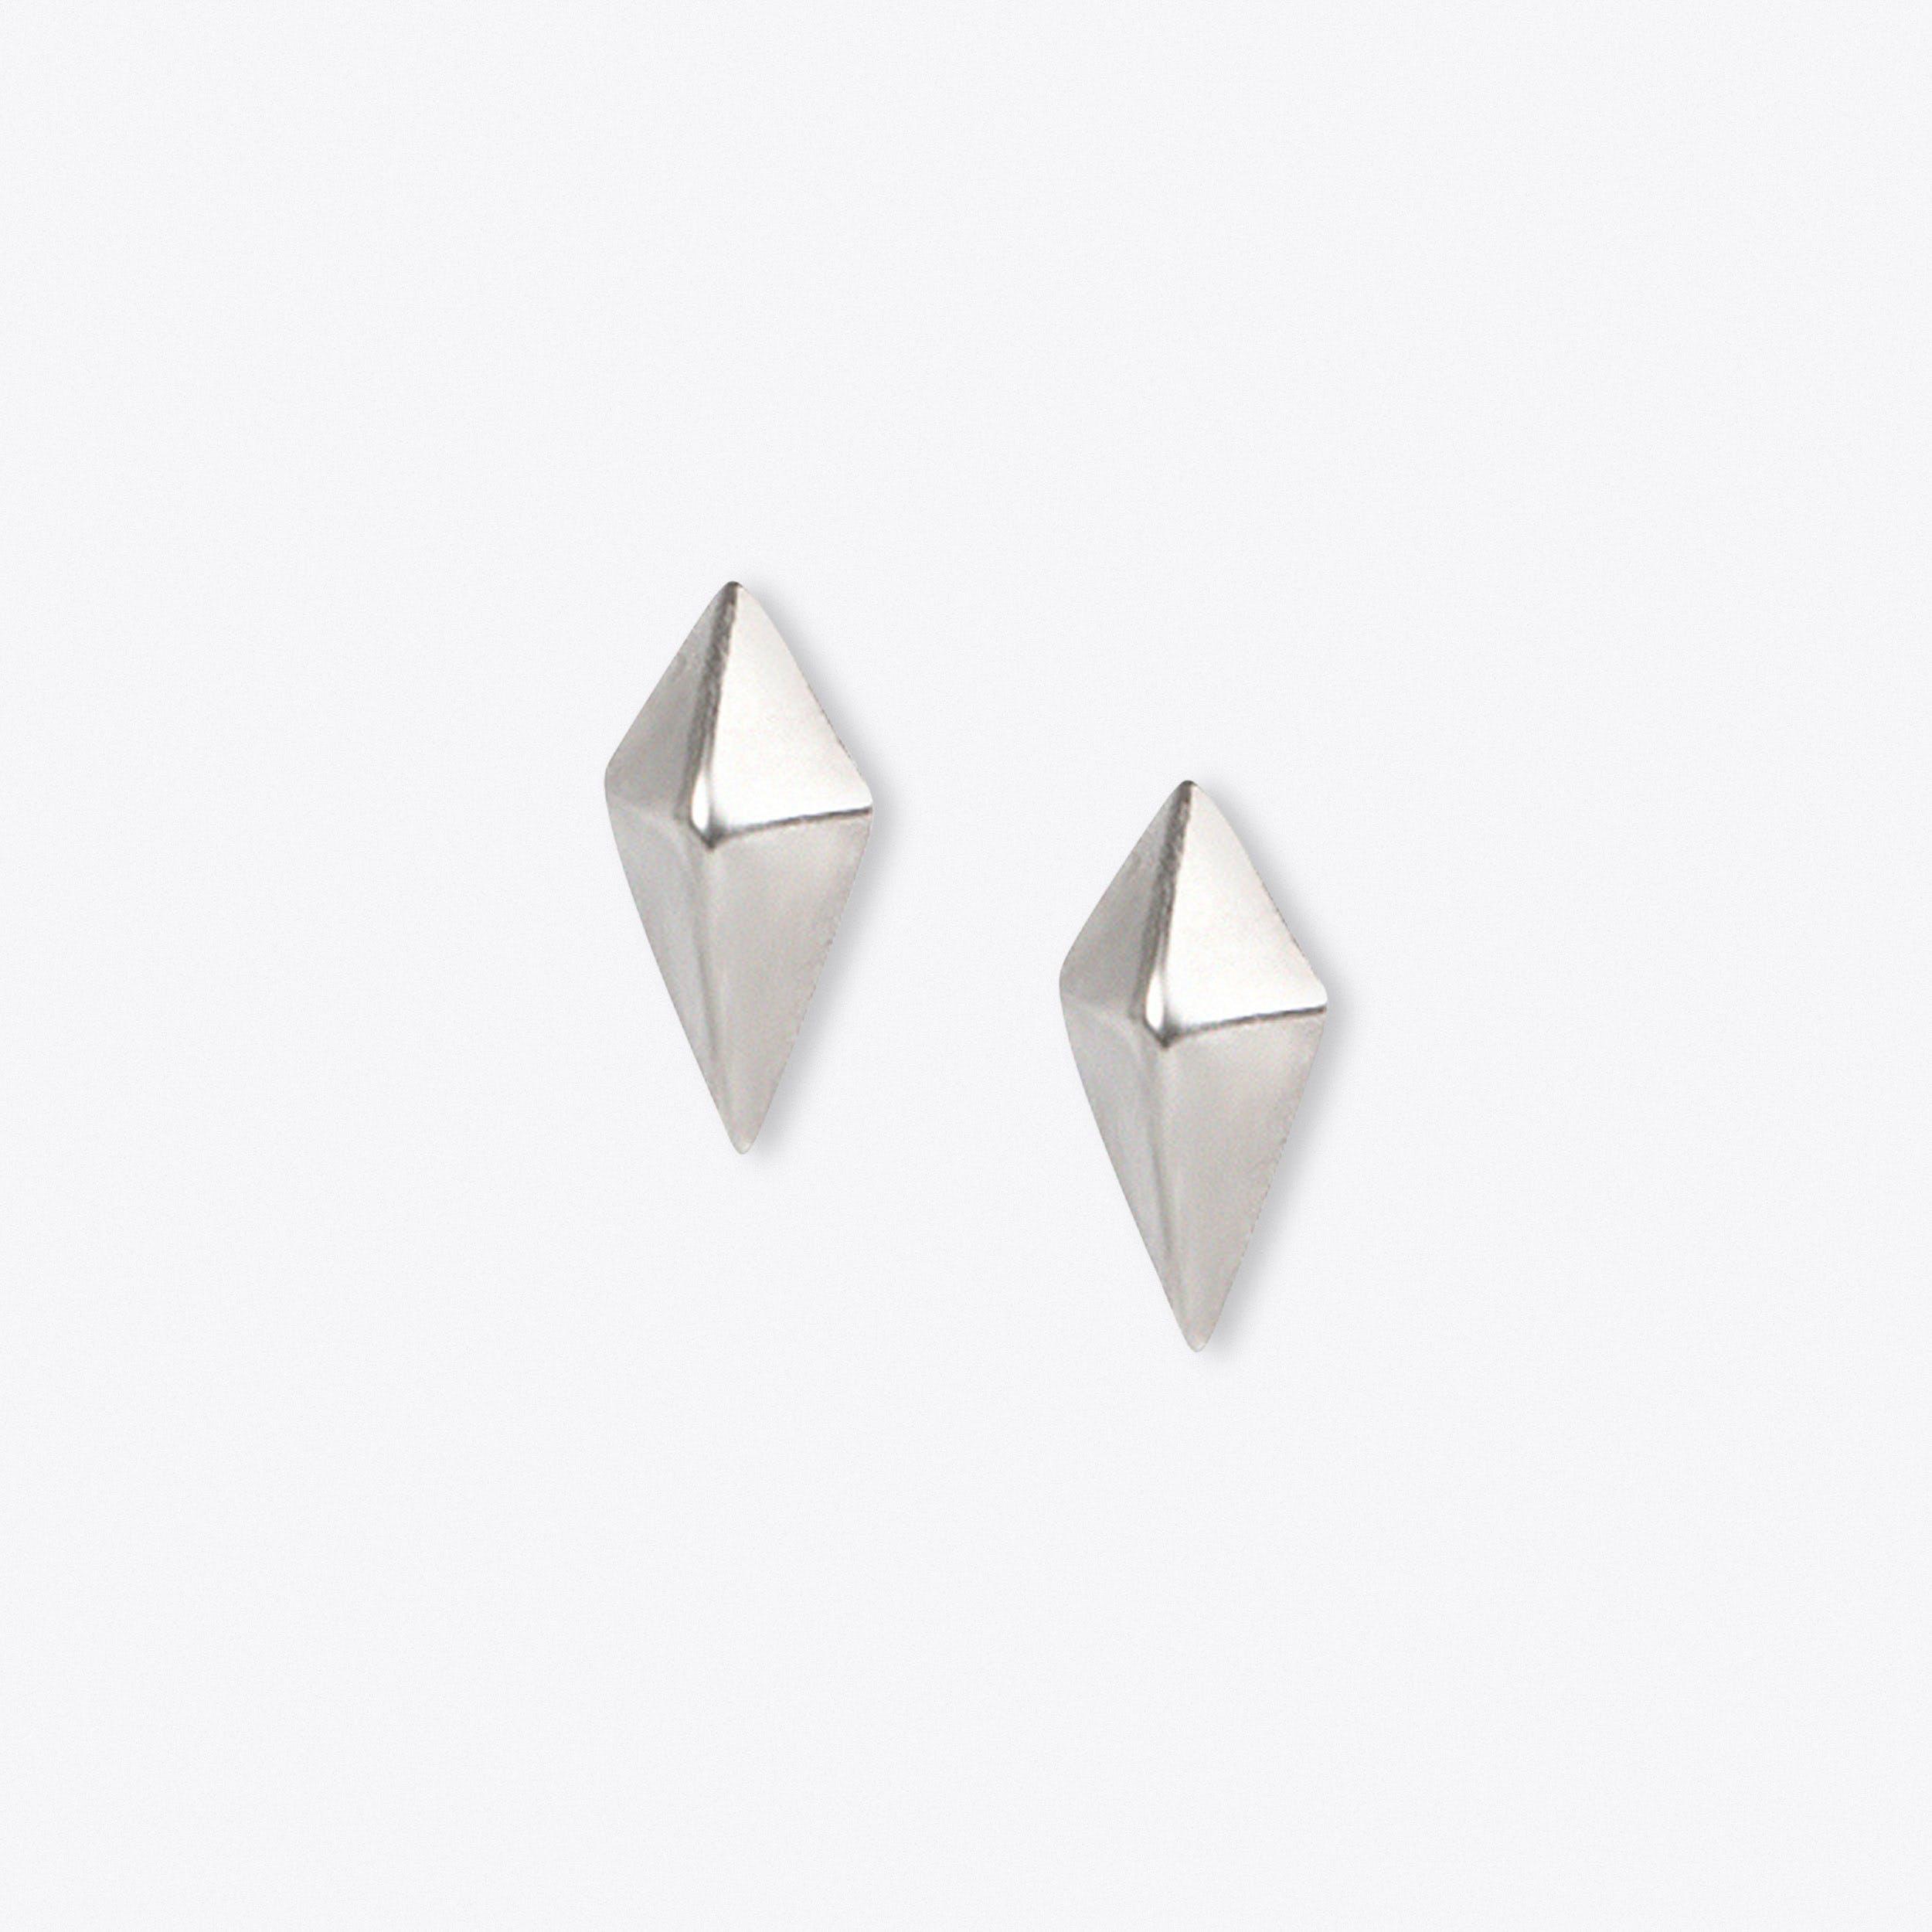 Kite Studs in Silver